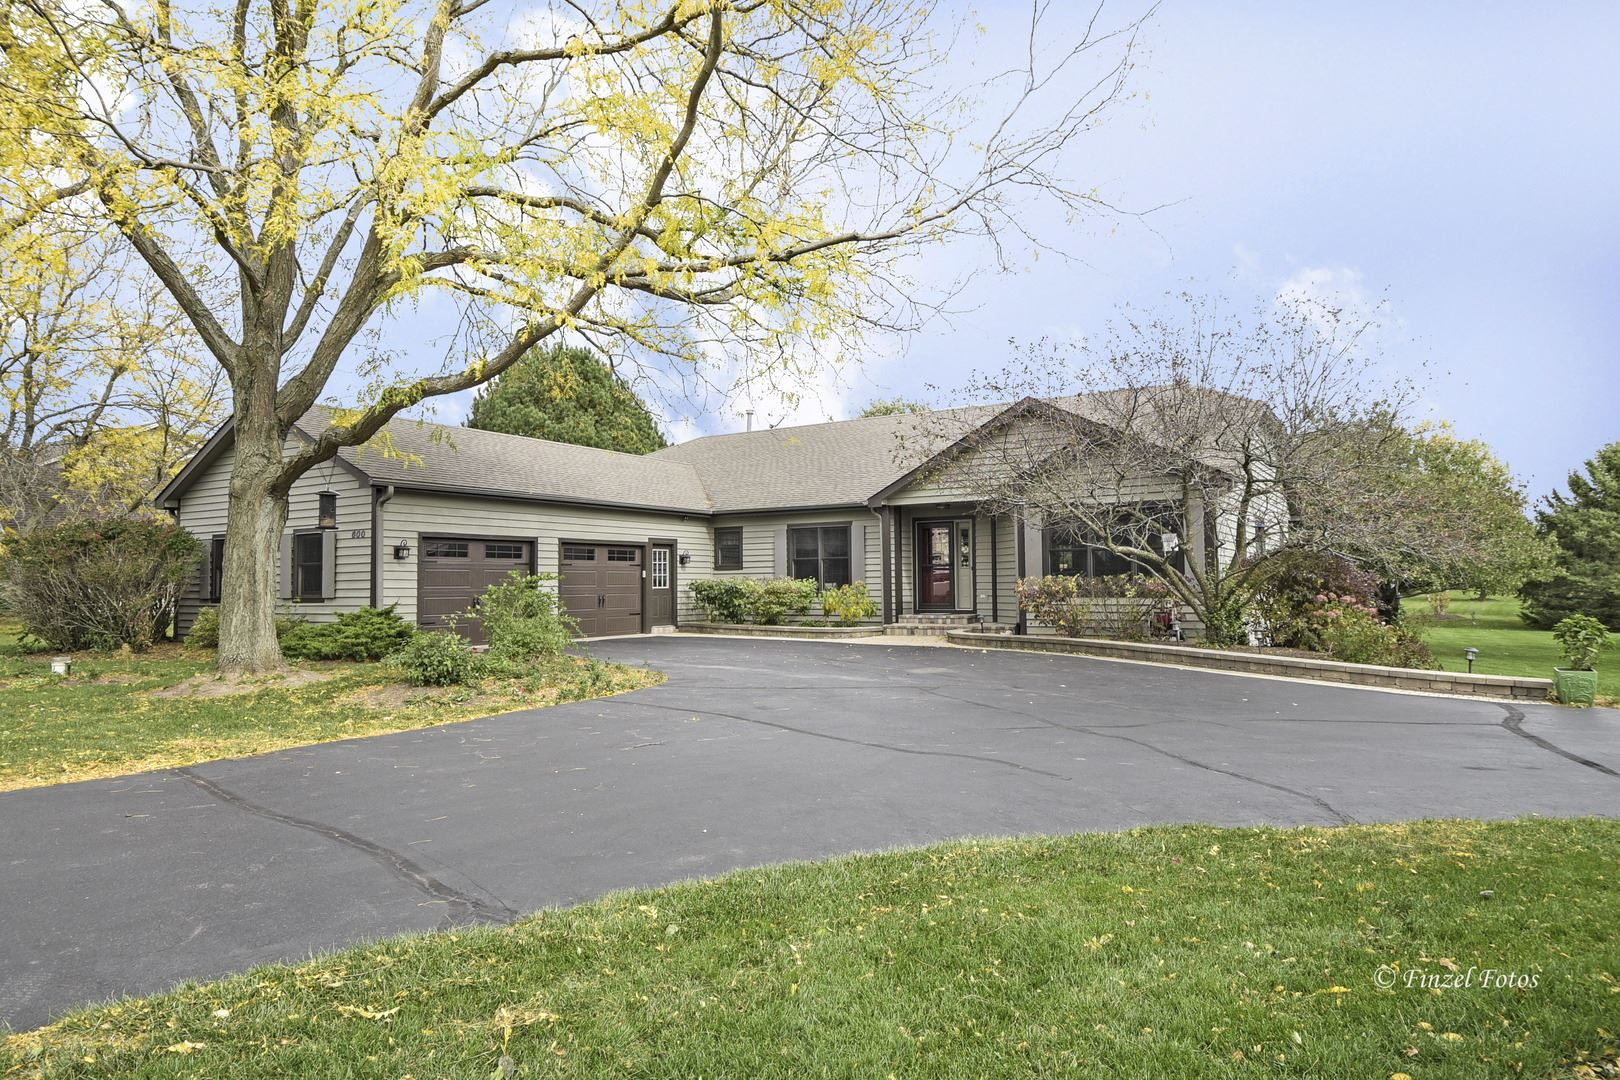 600 Silver Glen Road, McHenry, IL 60050 - #: 10905893